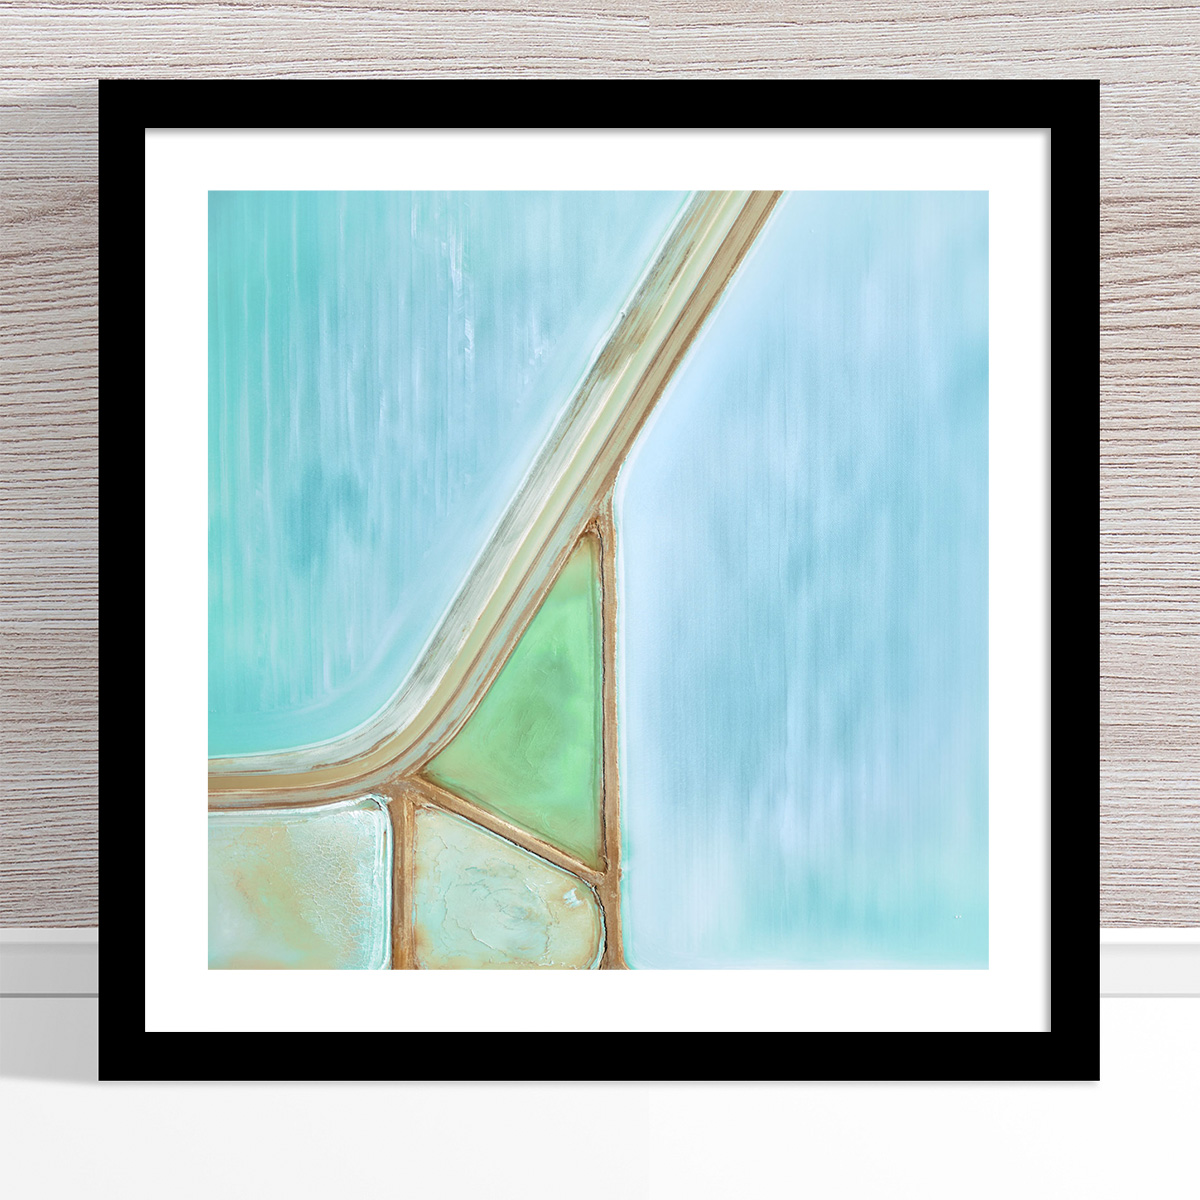 Chris Saunders - 'Aerial Salt 028' Black Frame